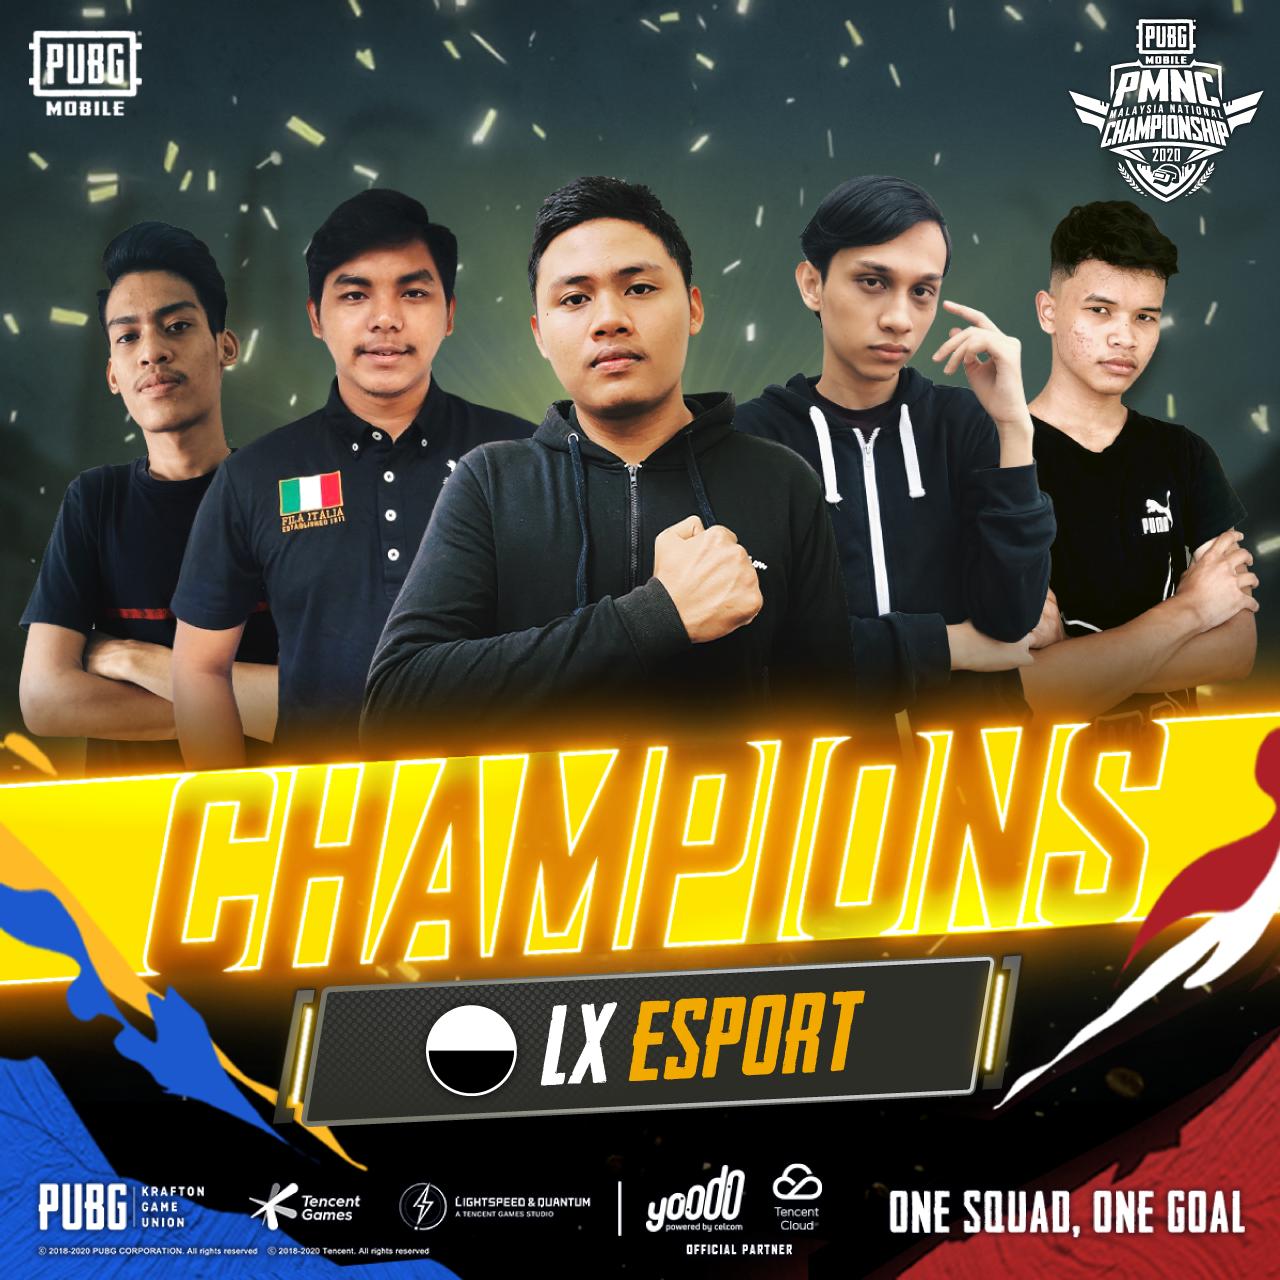 PMNC 2020 champions